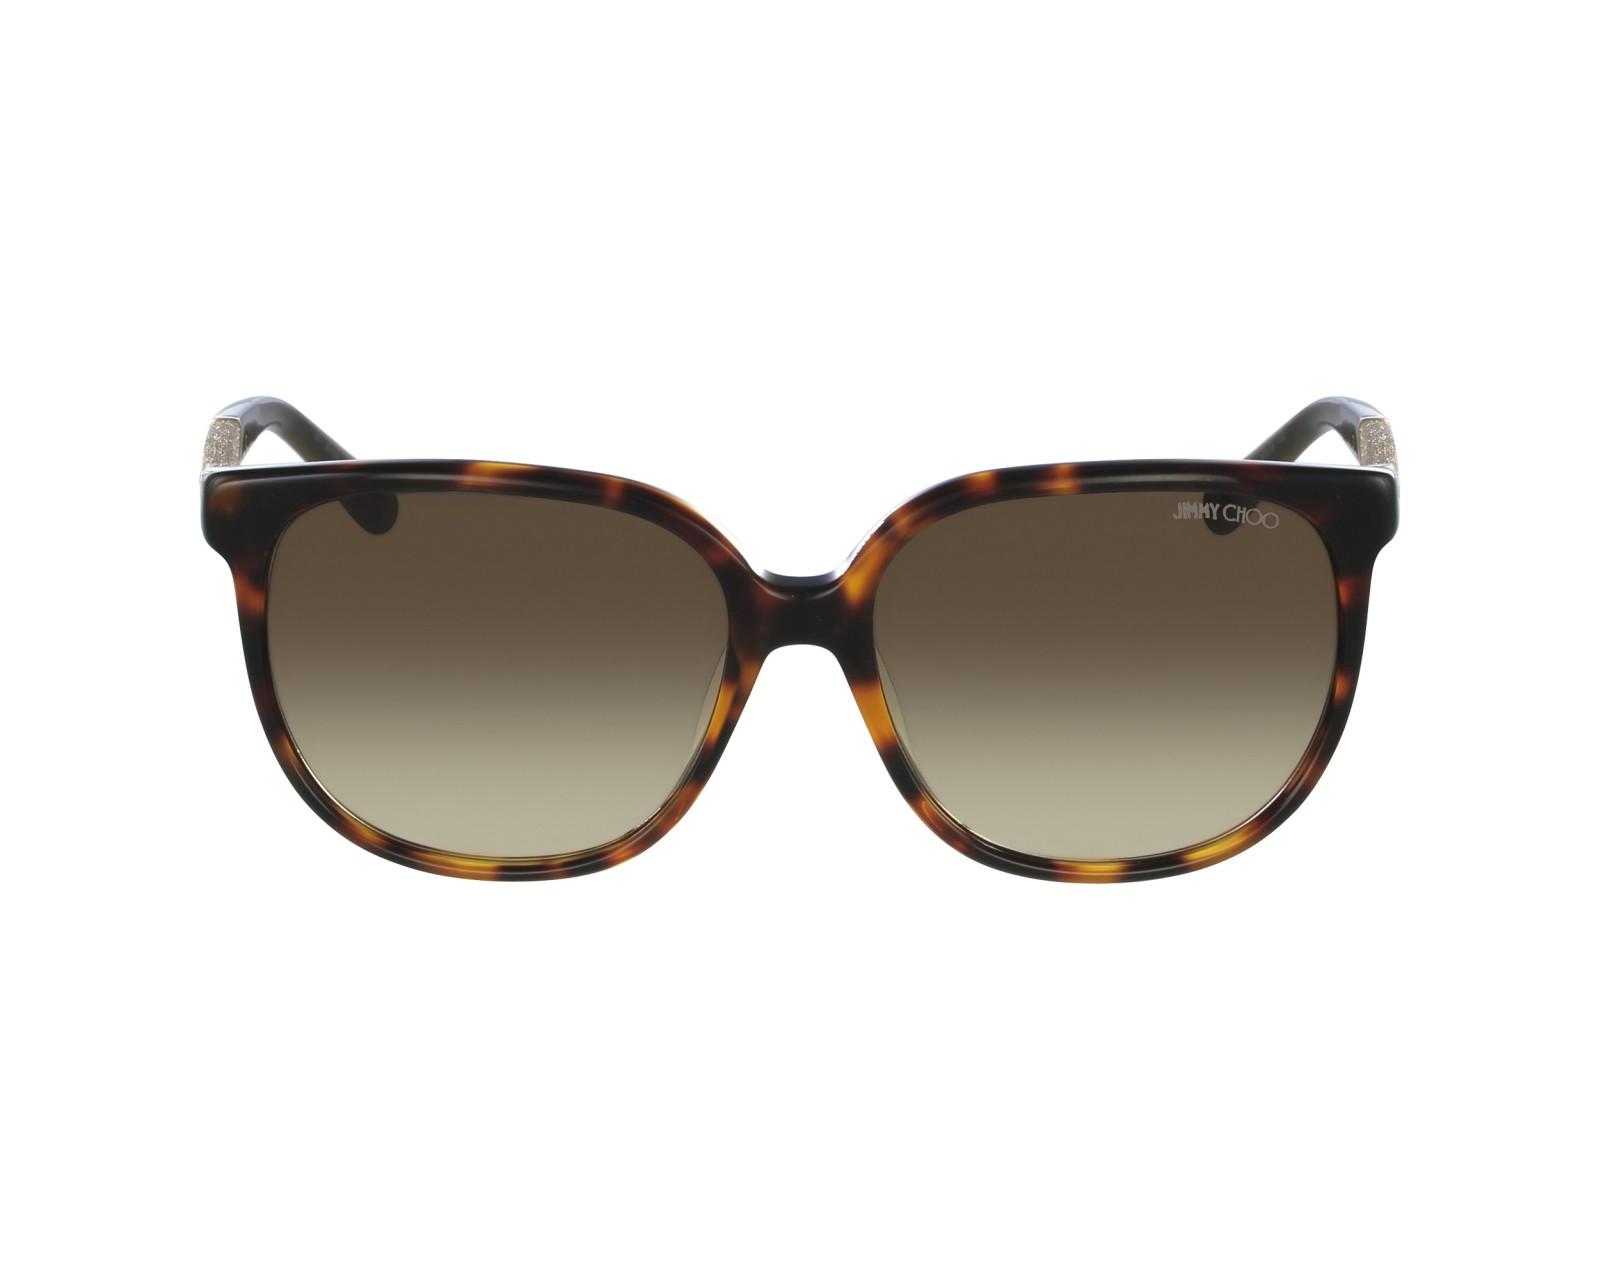 aee295dbd537 thumbnail Sunglasses Jimmy Choo PAULA-S VUU JD - Havana Gold profile view